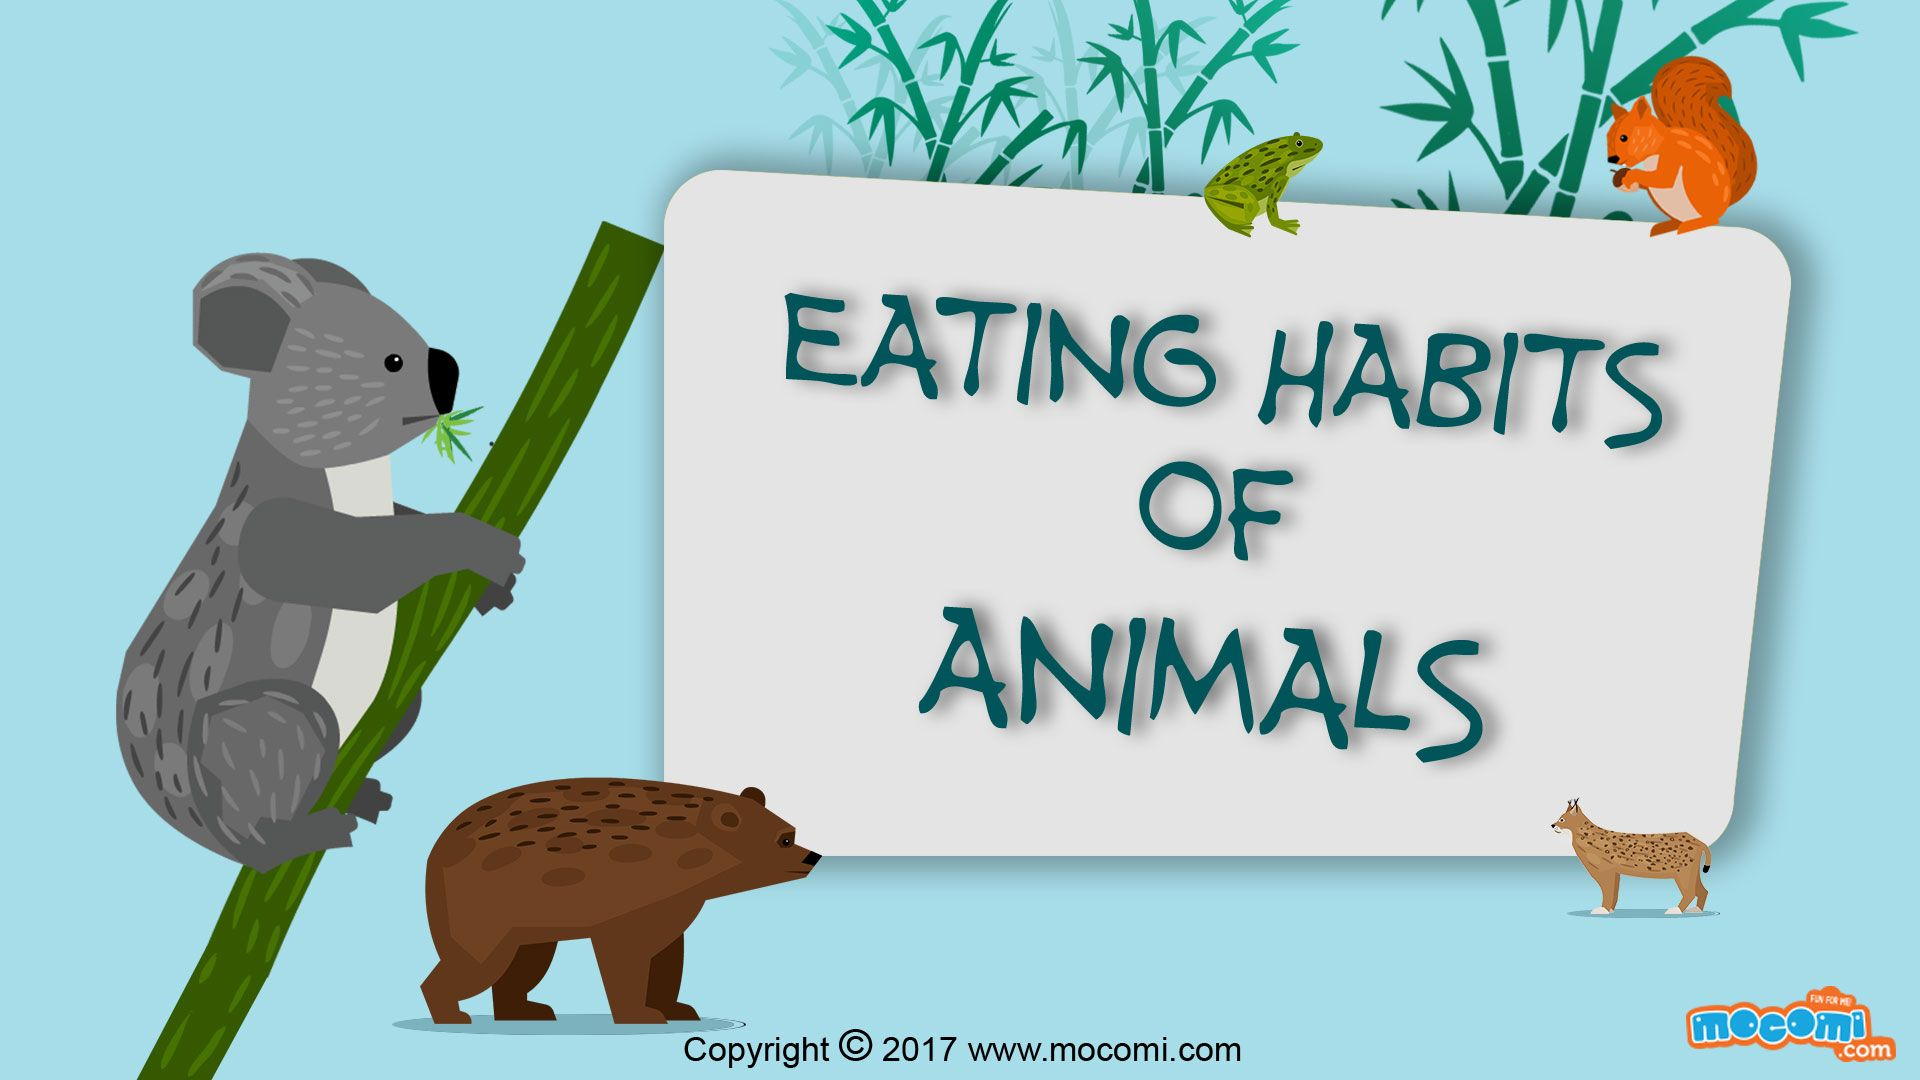 Eating Habits Of Animals Biology For Kids Mocomi Eating